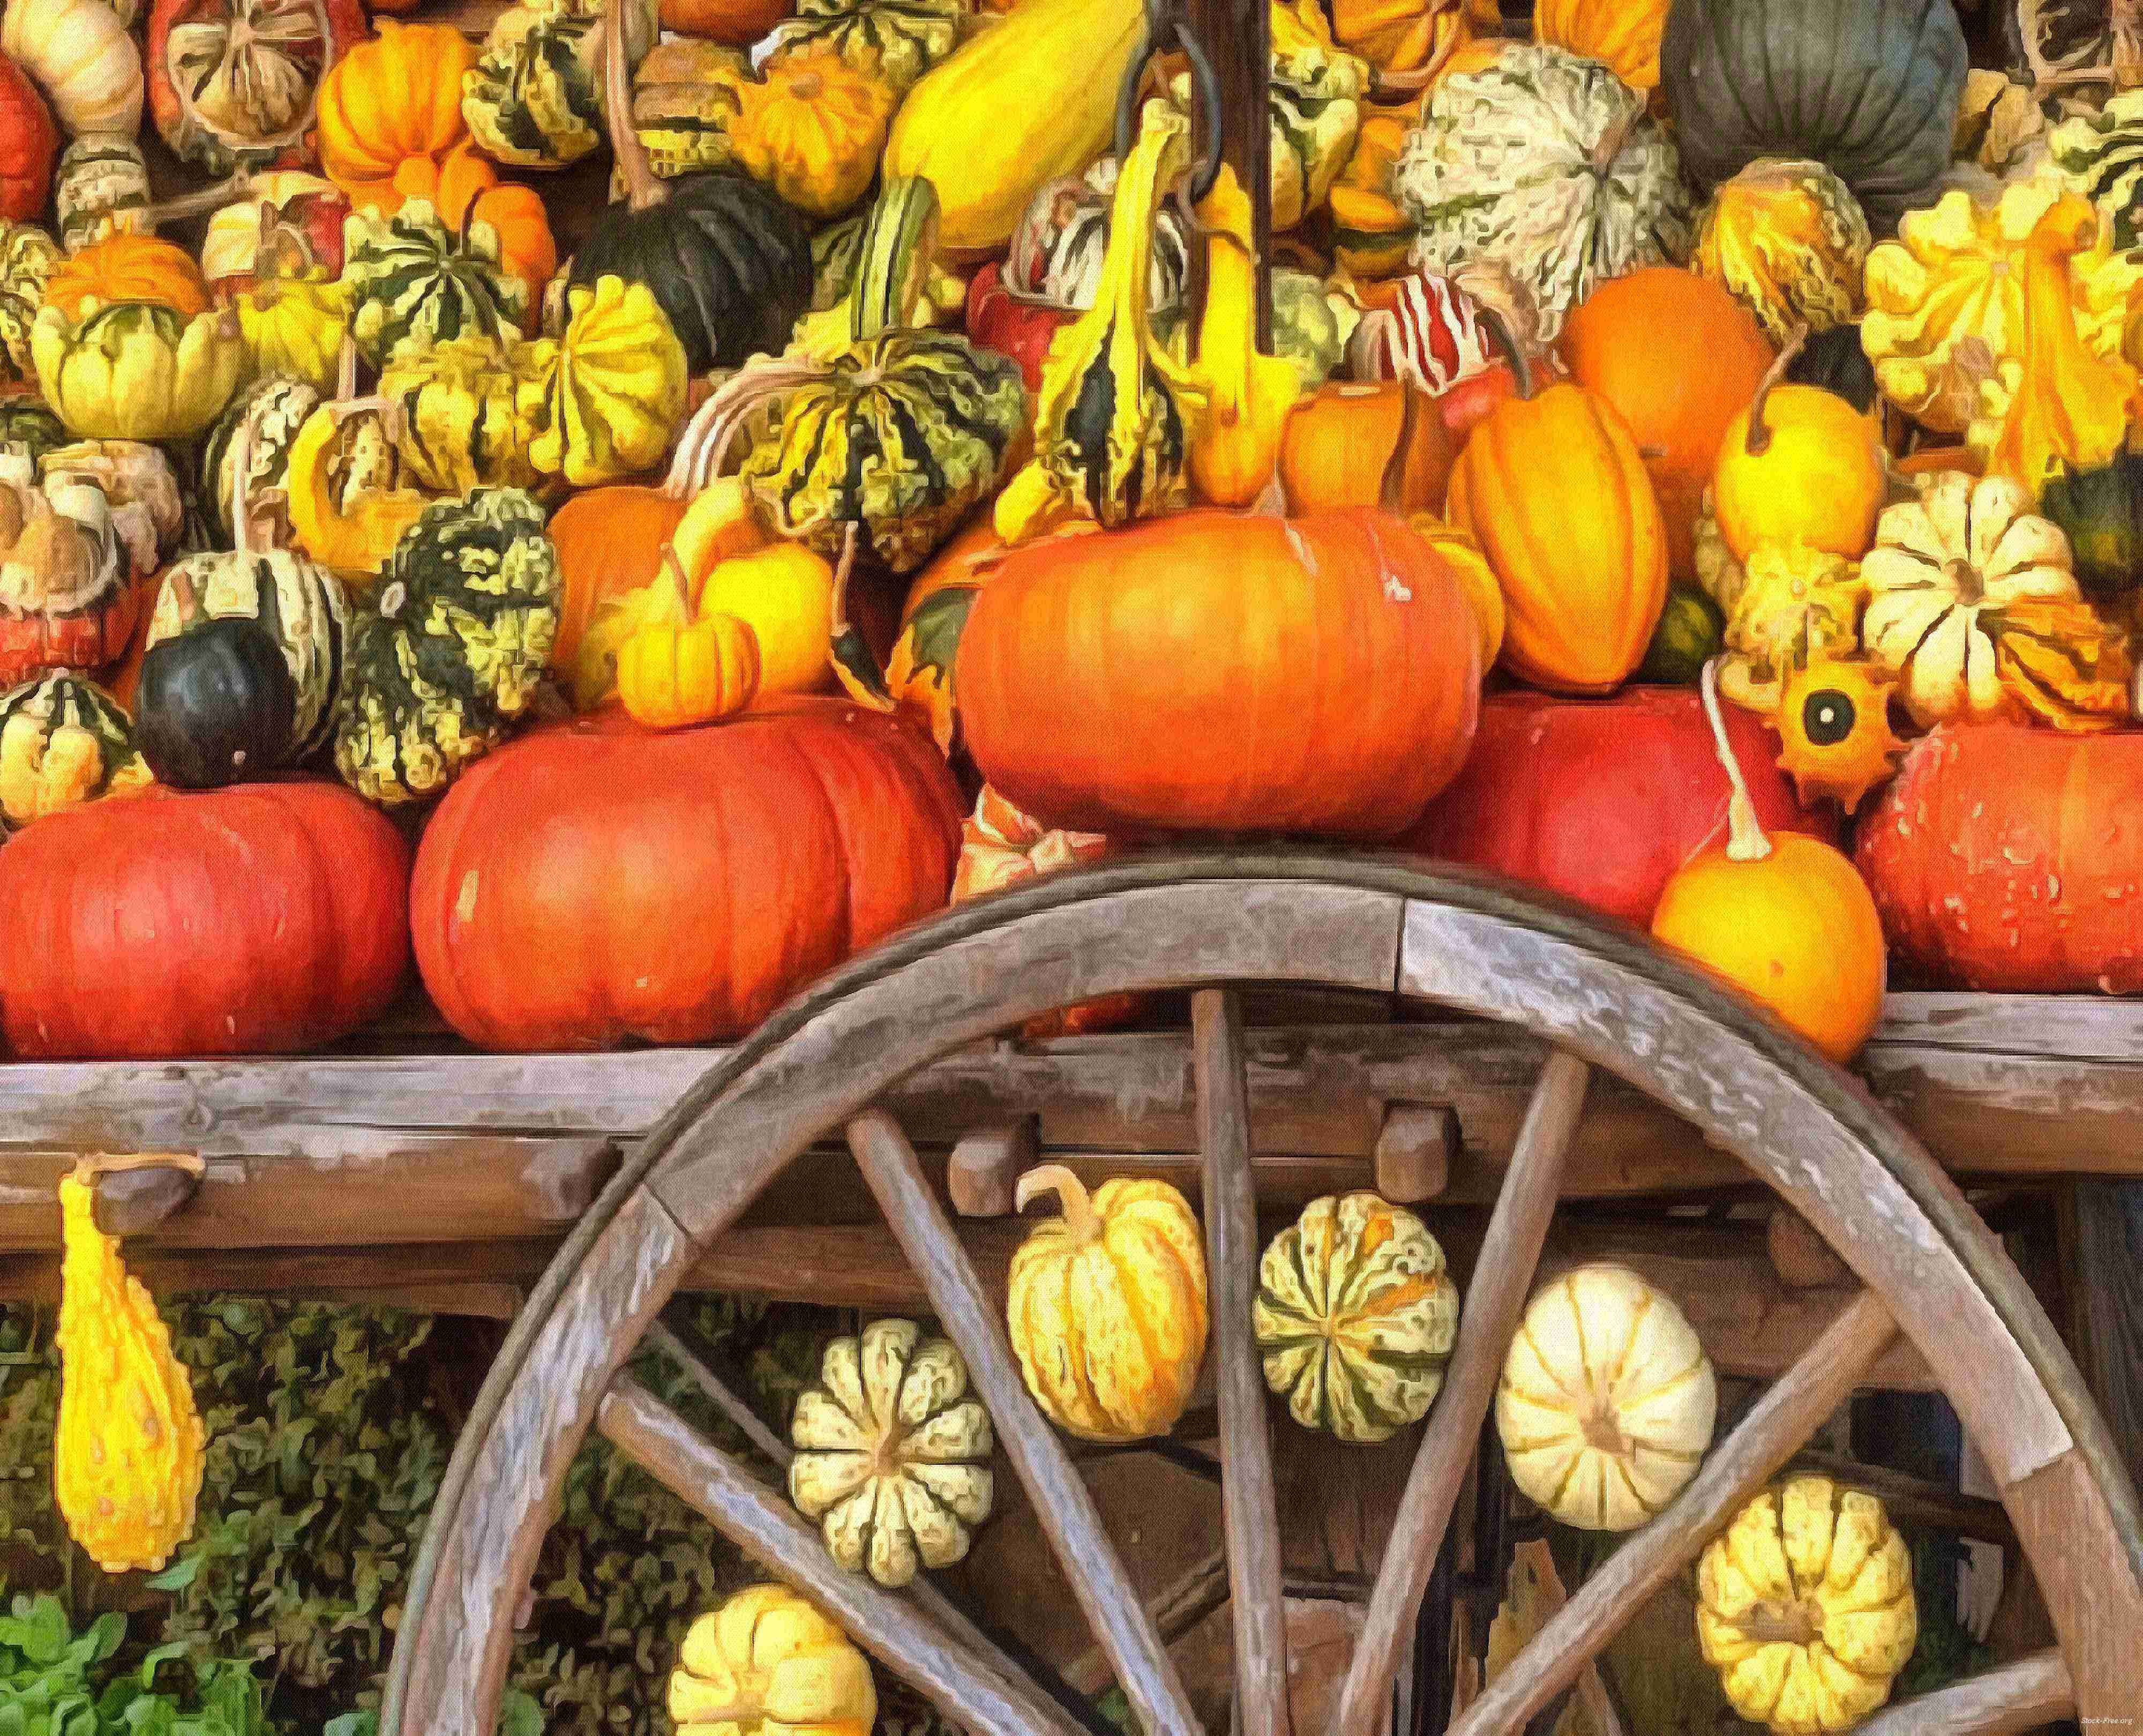 pumpkin, wheelbarrow, cart, trade, tray, stall, holiday, lots of pumpkins, garden, spooky, halloween -  stock free photos, public domain images, download free images, free stock images, public domain